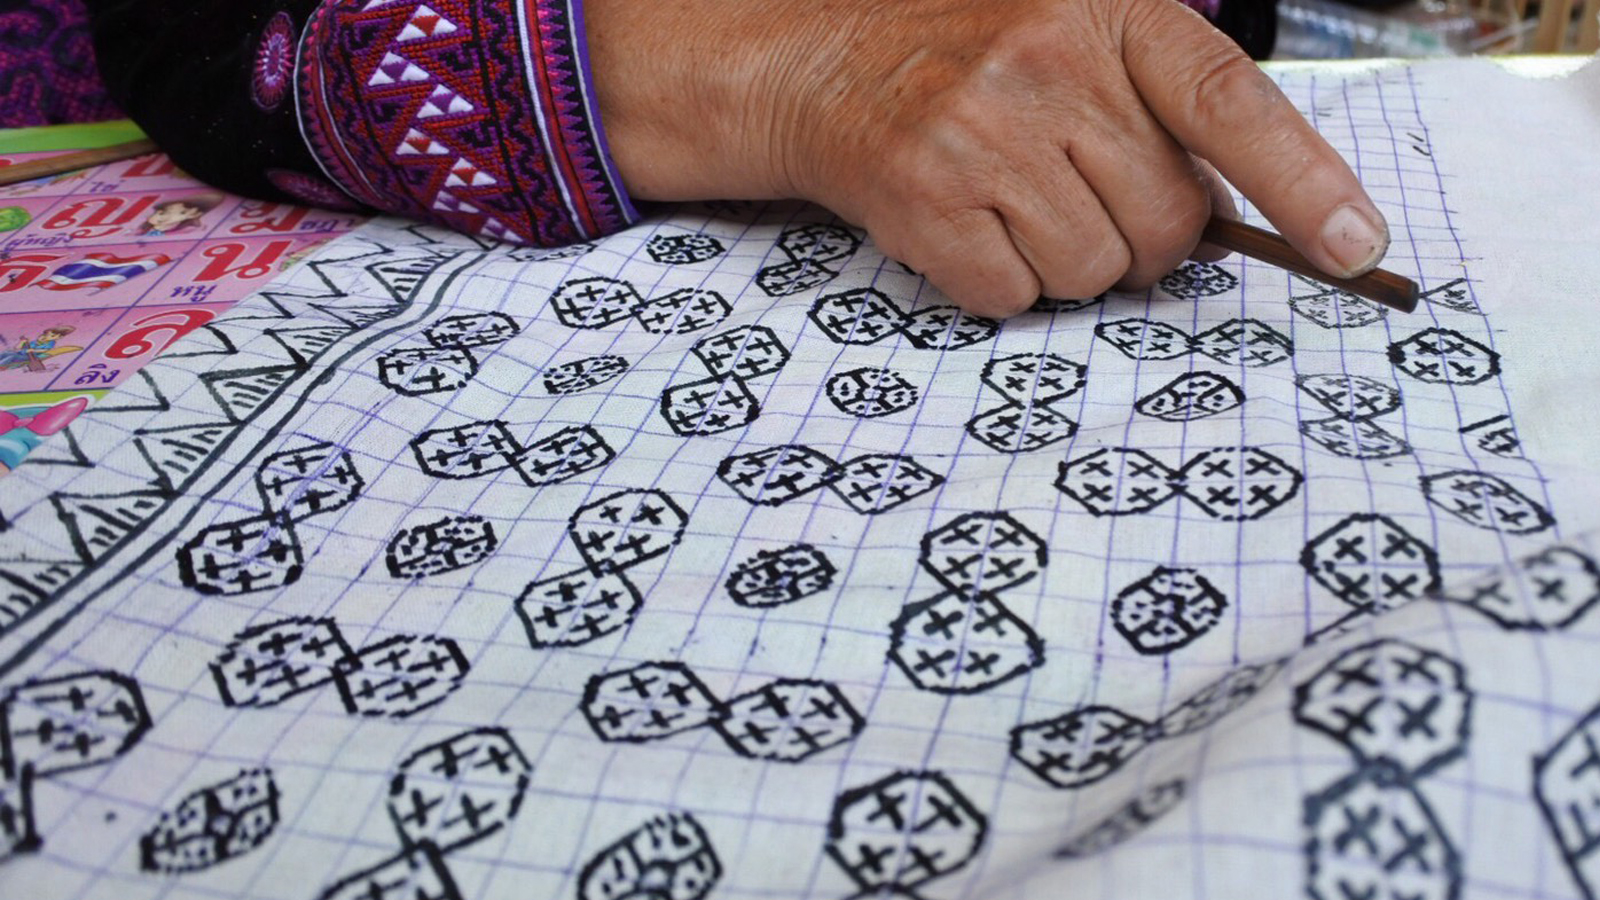 MADE BY HOTCAKE : แบรนด์ที่ชวนช่างฝีมือทั่วไทยจากเชียงใหม่ถึงยะลามาทำเสื้อผ้าด้วยกัน